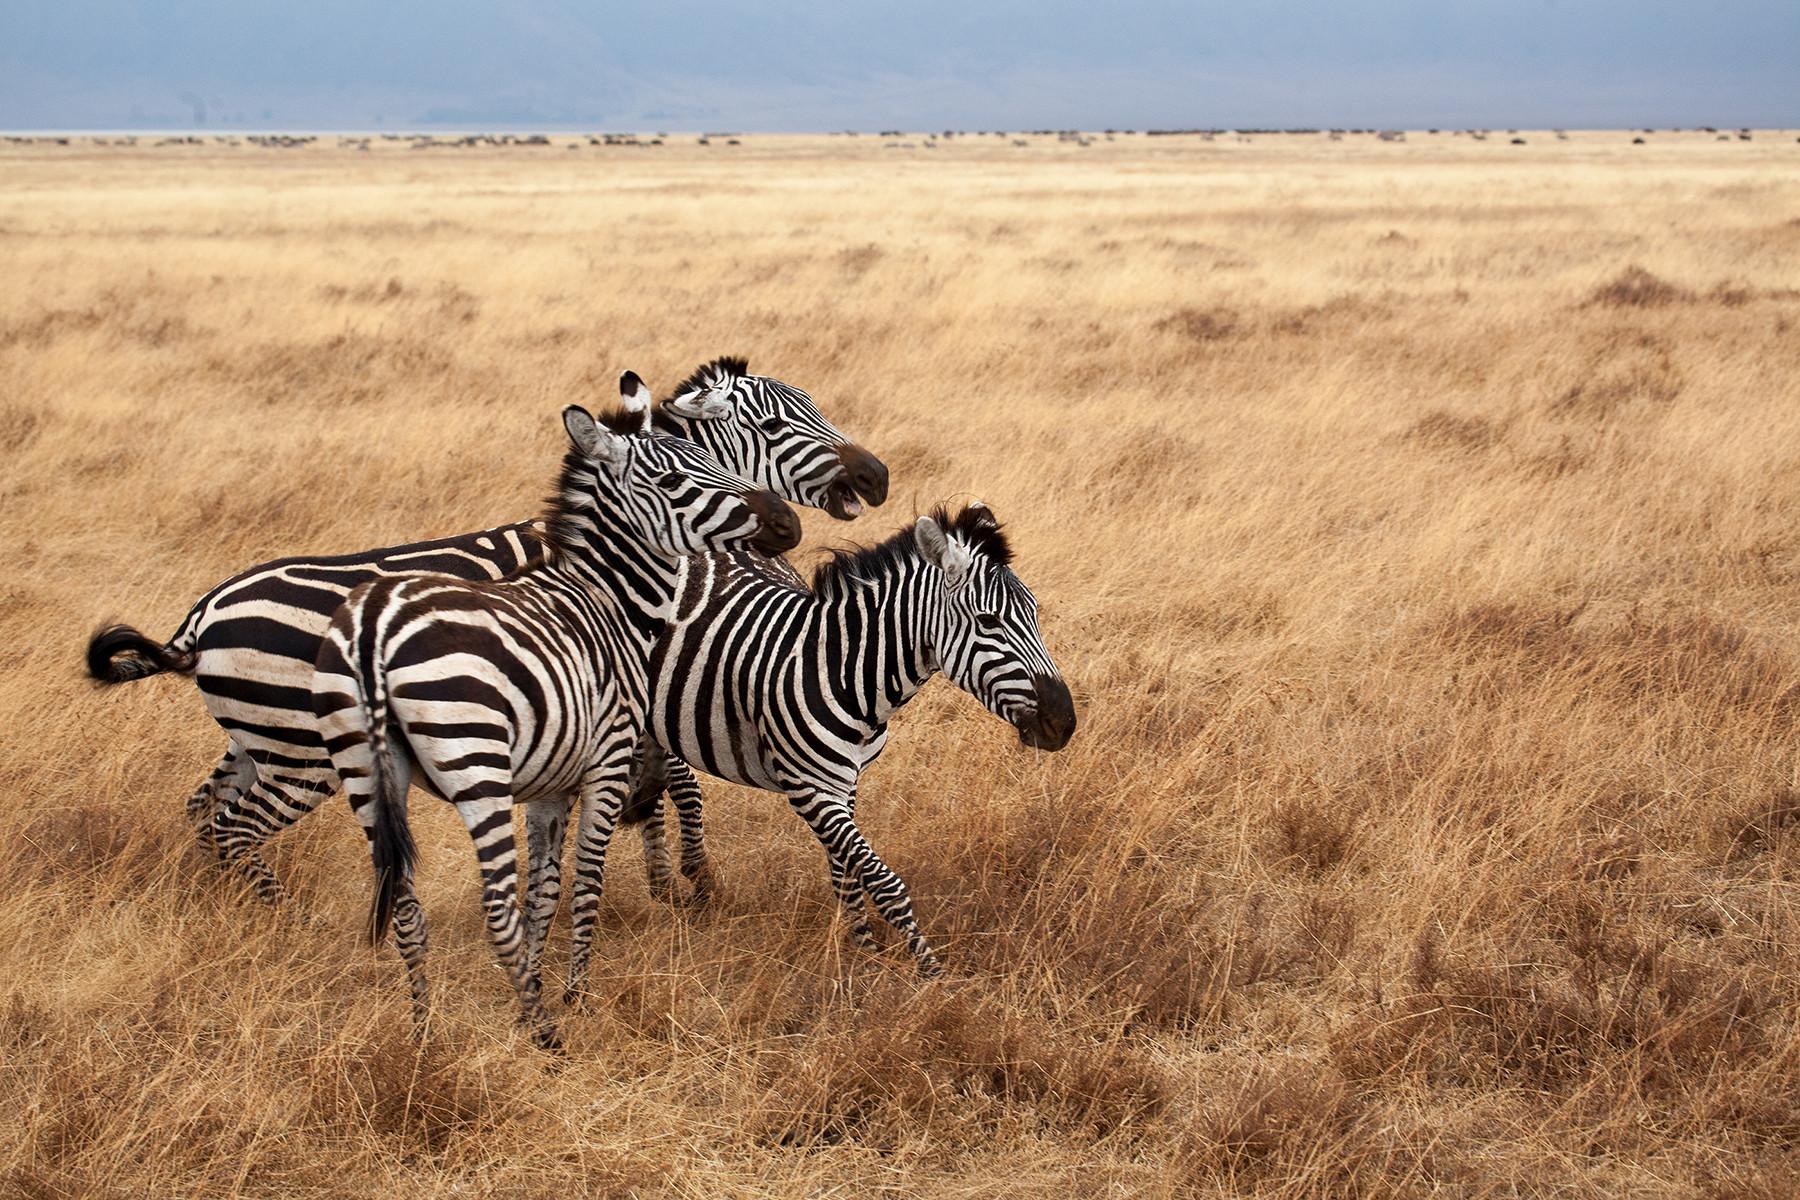 Zebras in African landscape